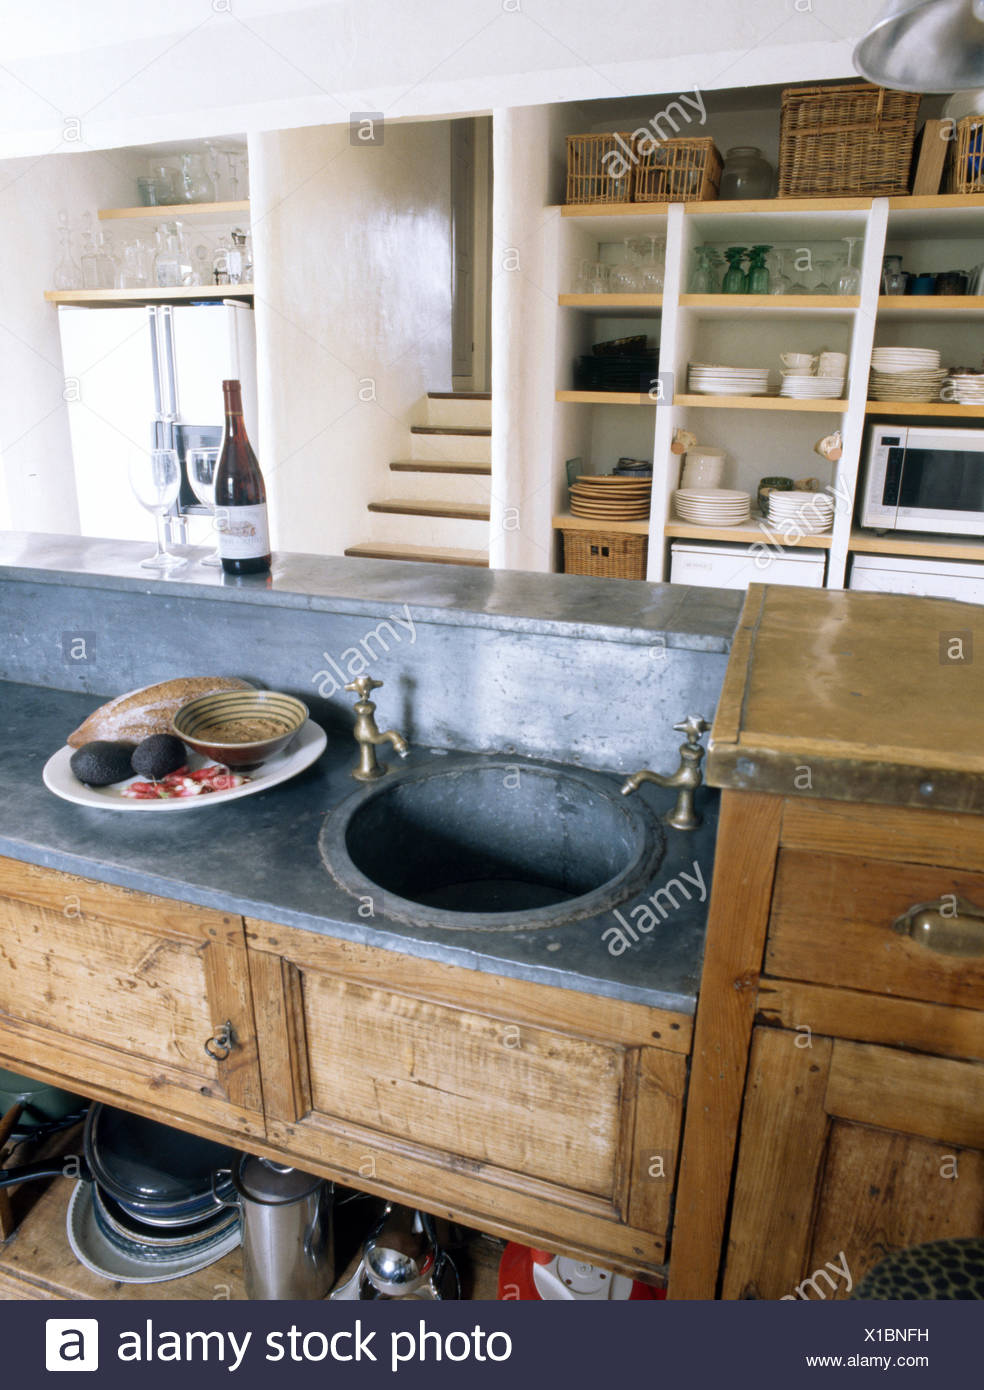 Full Size of Anrichte Küche Ebay Kleinanzeigen Anrichte Küche Klein Sideboard Küche Amazon Anrichte Küche Gebraucht Küche Anrichte Küche